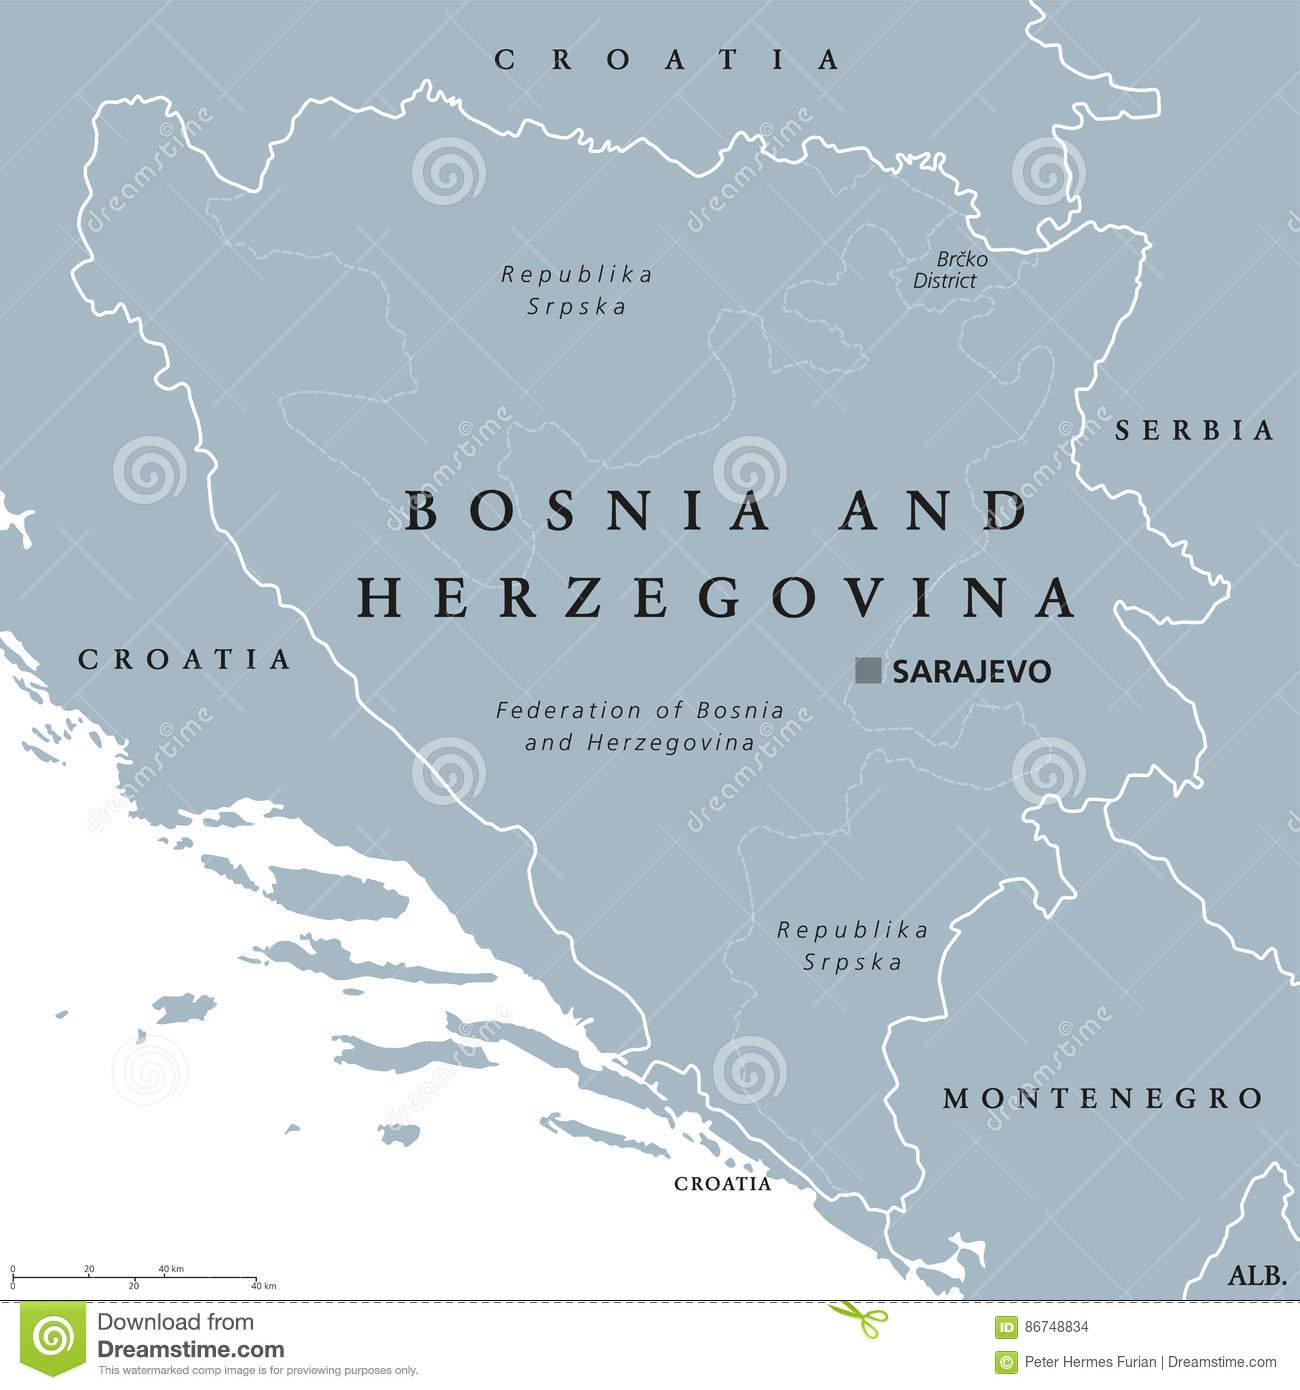 Carte Politique De La Bosnie-Herzégovine Avec La Capitale pour Carte Capitale Europe